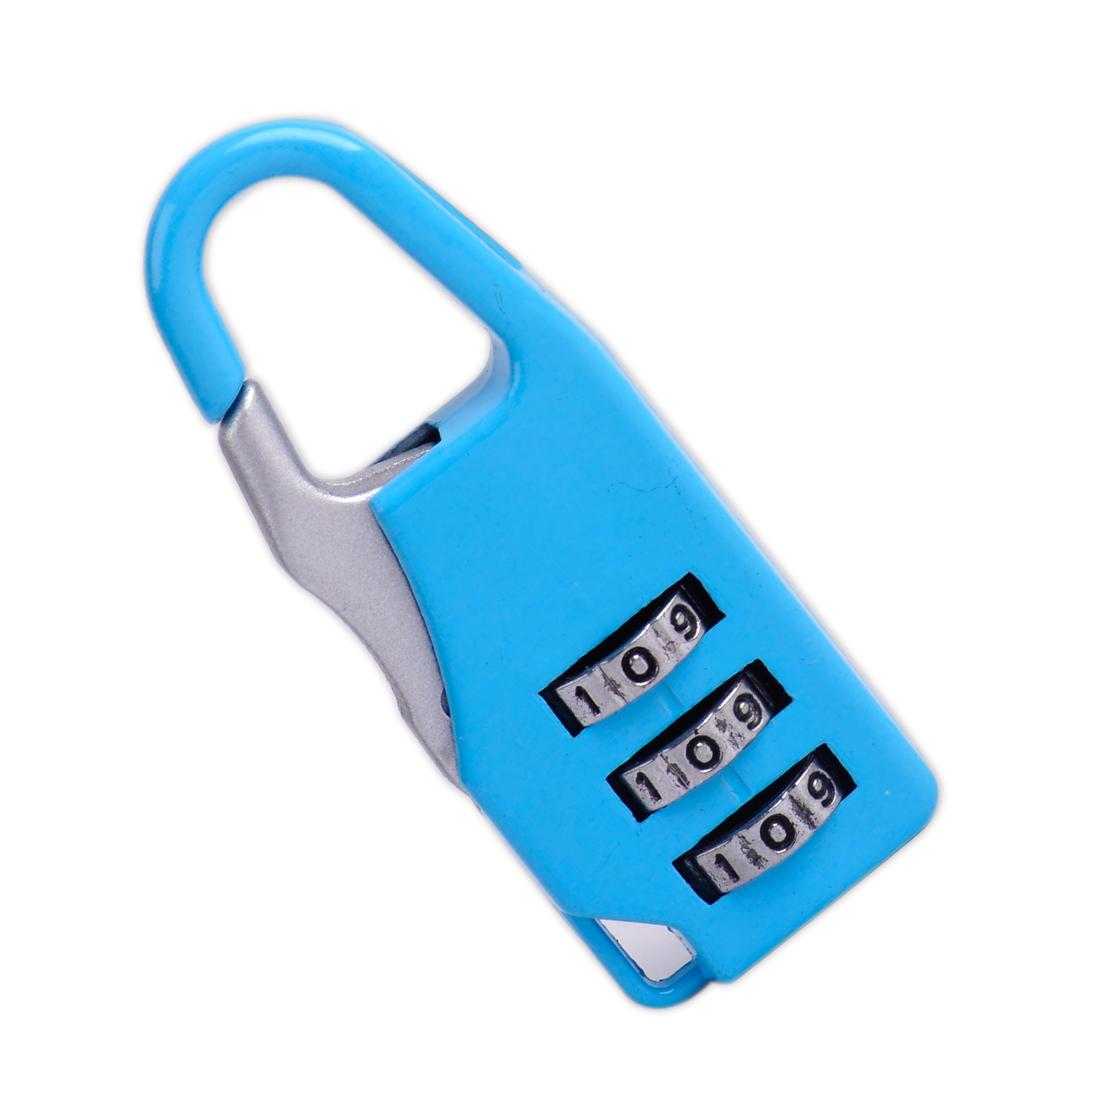 mini 3 digit combination padlock safe travel luggage suitcase code password l. Black Bedroom Furniture Sets. Home Design Ideas